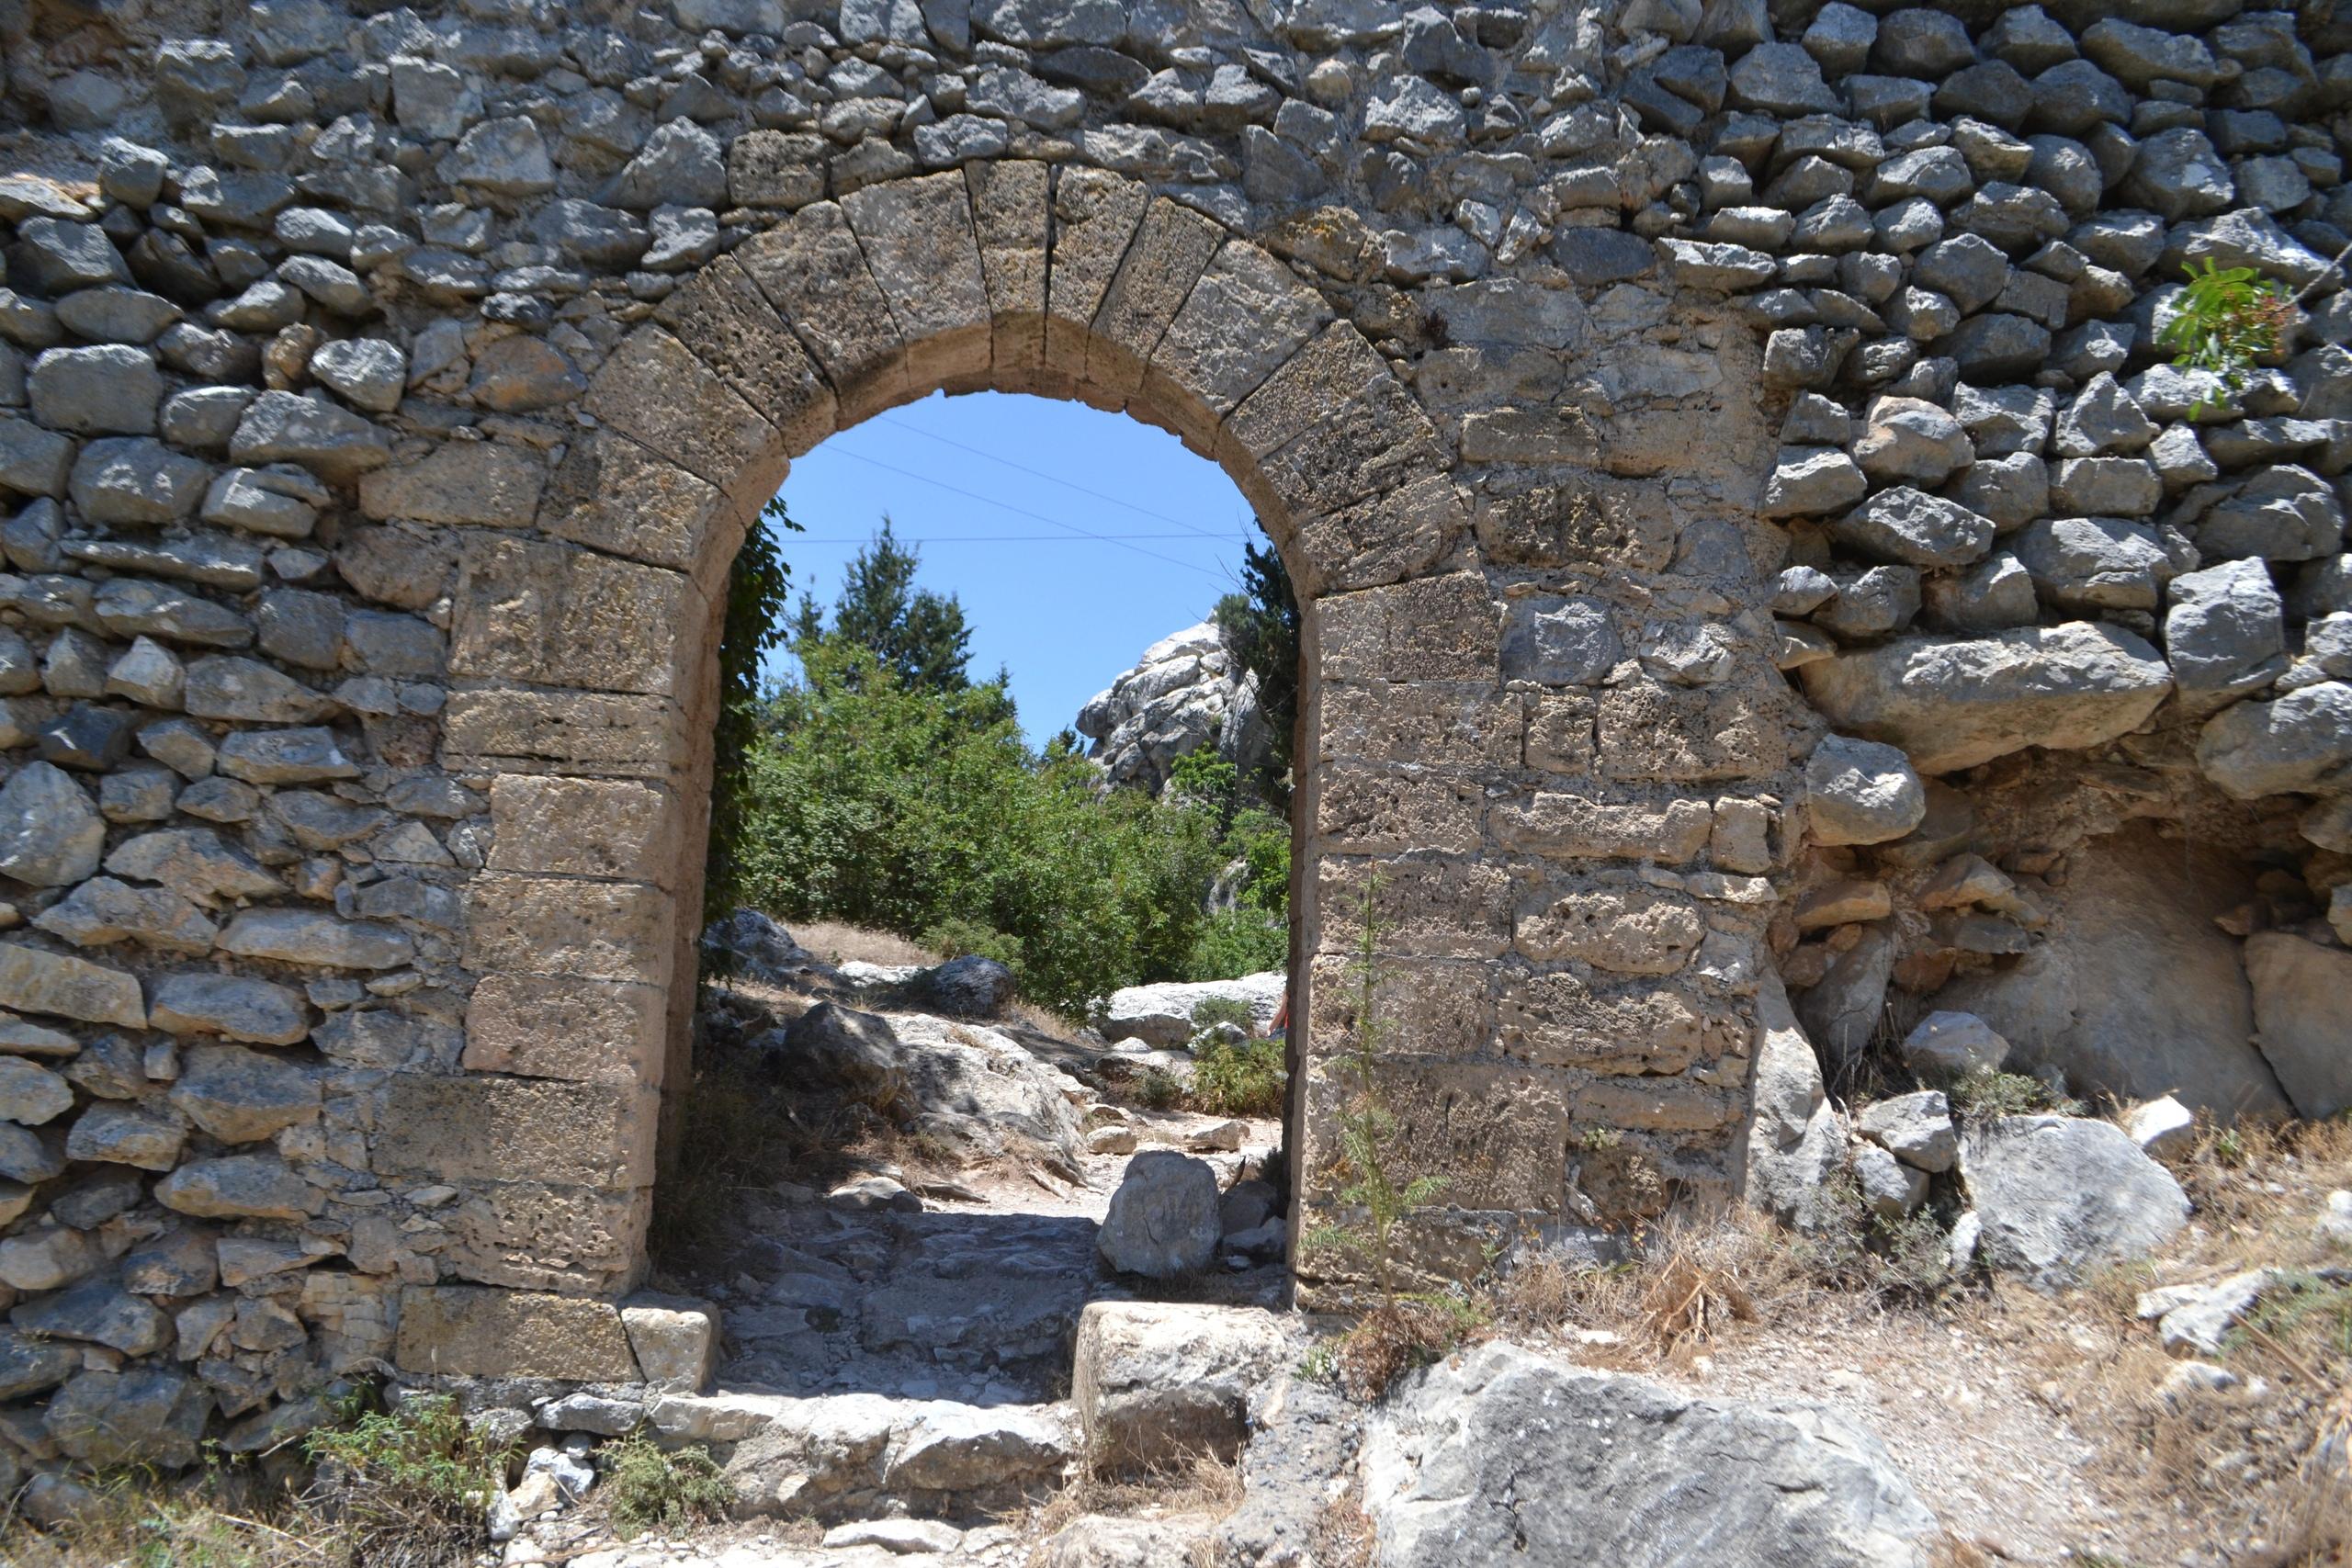 Северный Кипр. Замок Святого Иллариона. (фото). - Страница 3 Kqd6b9tcZ_g